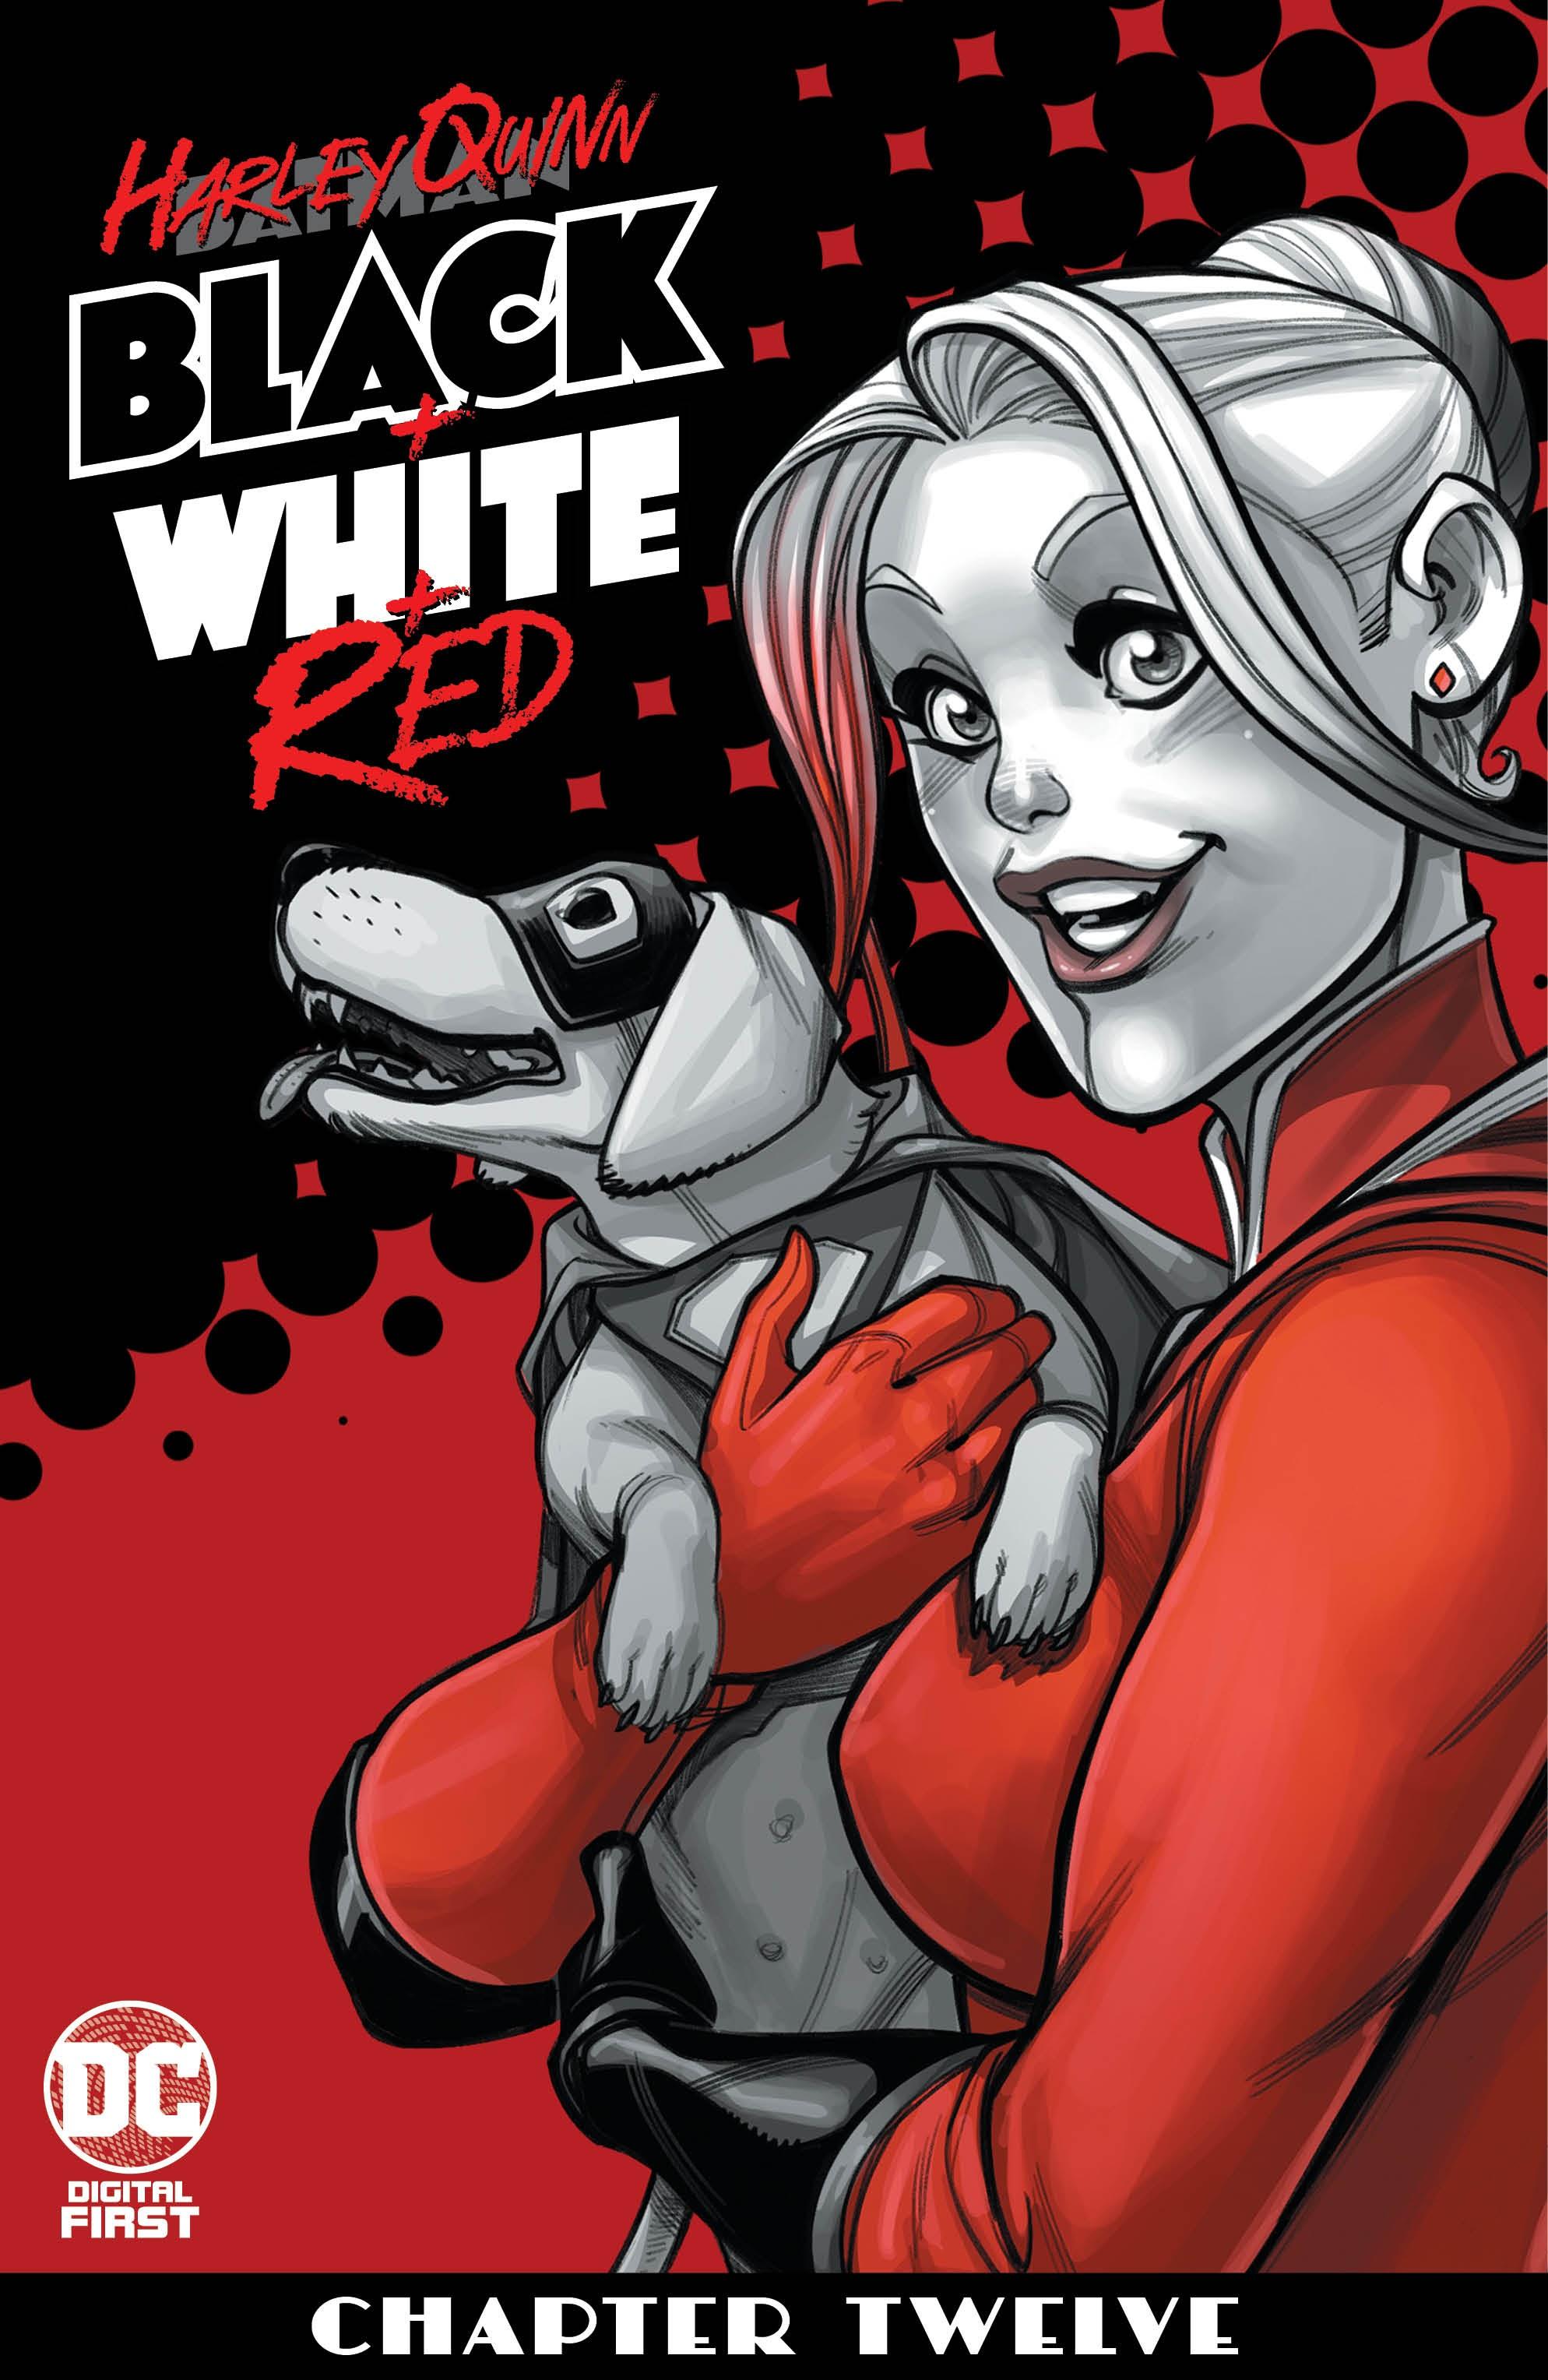 Harley Quinn: Black + White + Red Vol 1 12 (Digital)